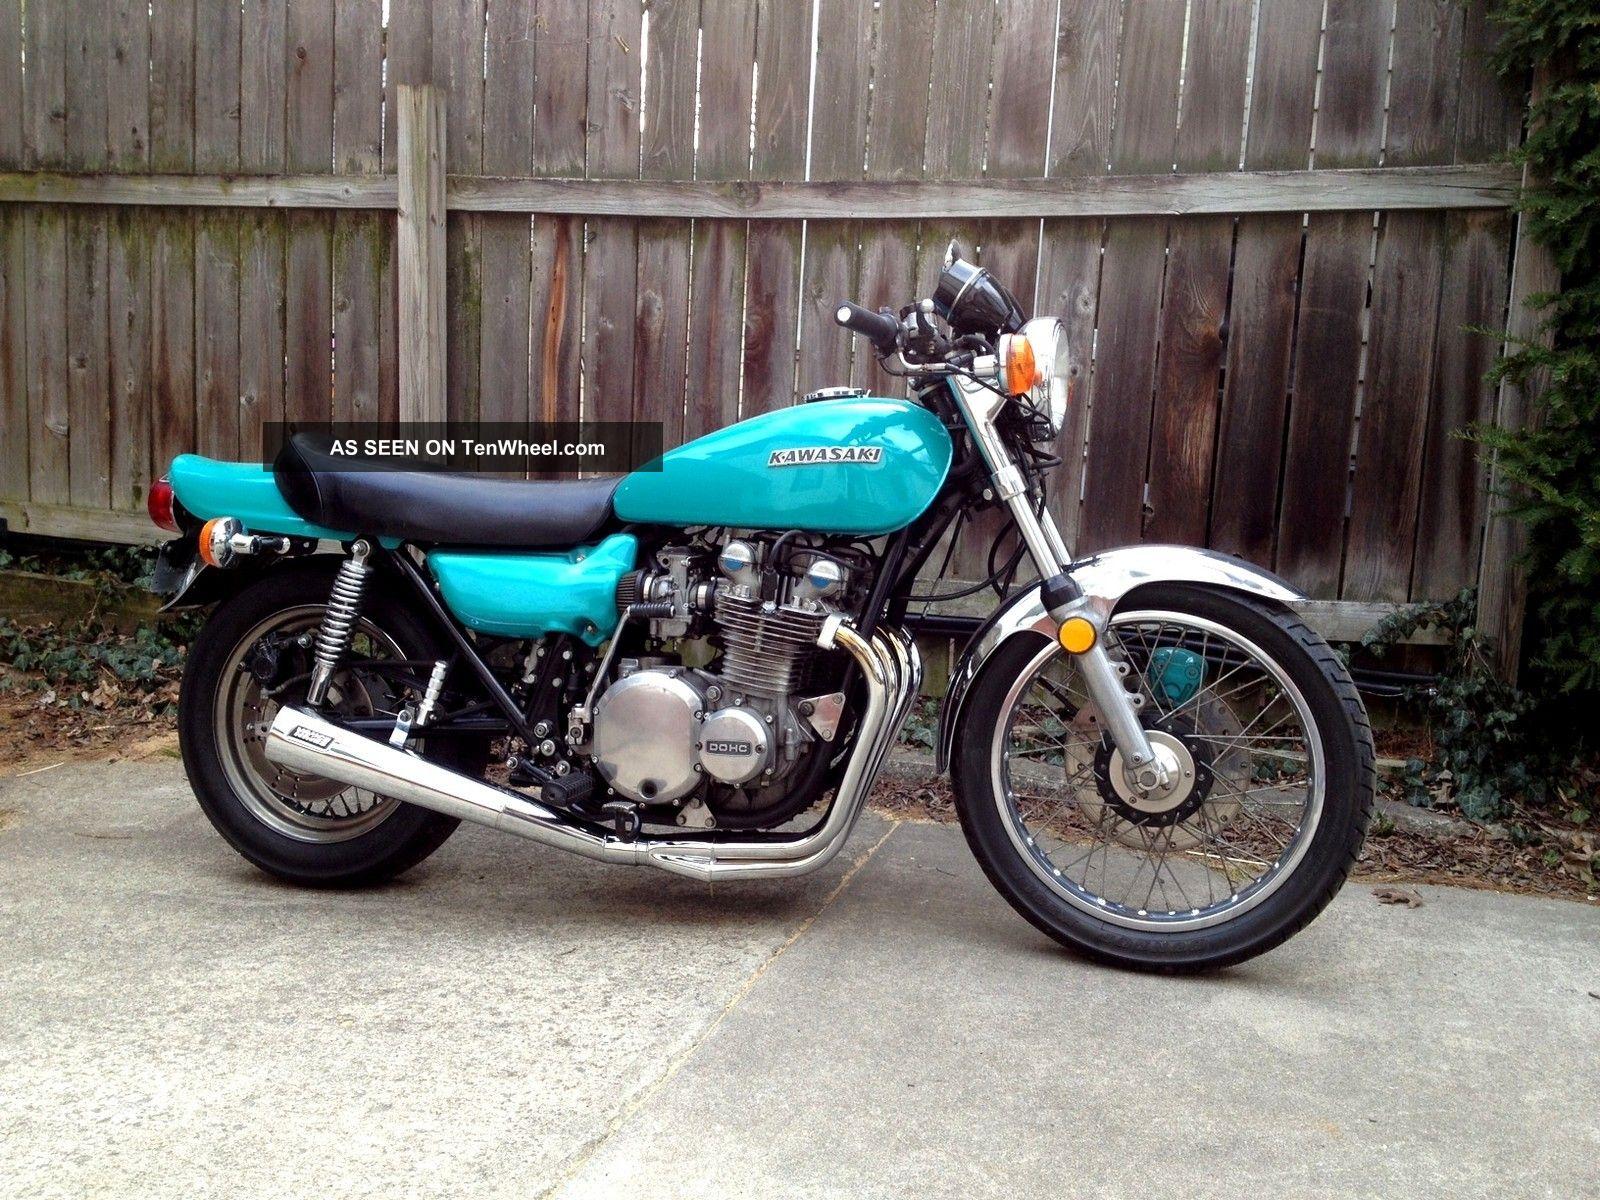 1974 Kawasaki Z1 900 Vintage Motorcycle Clear Title